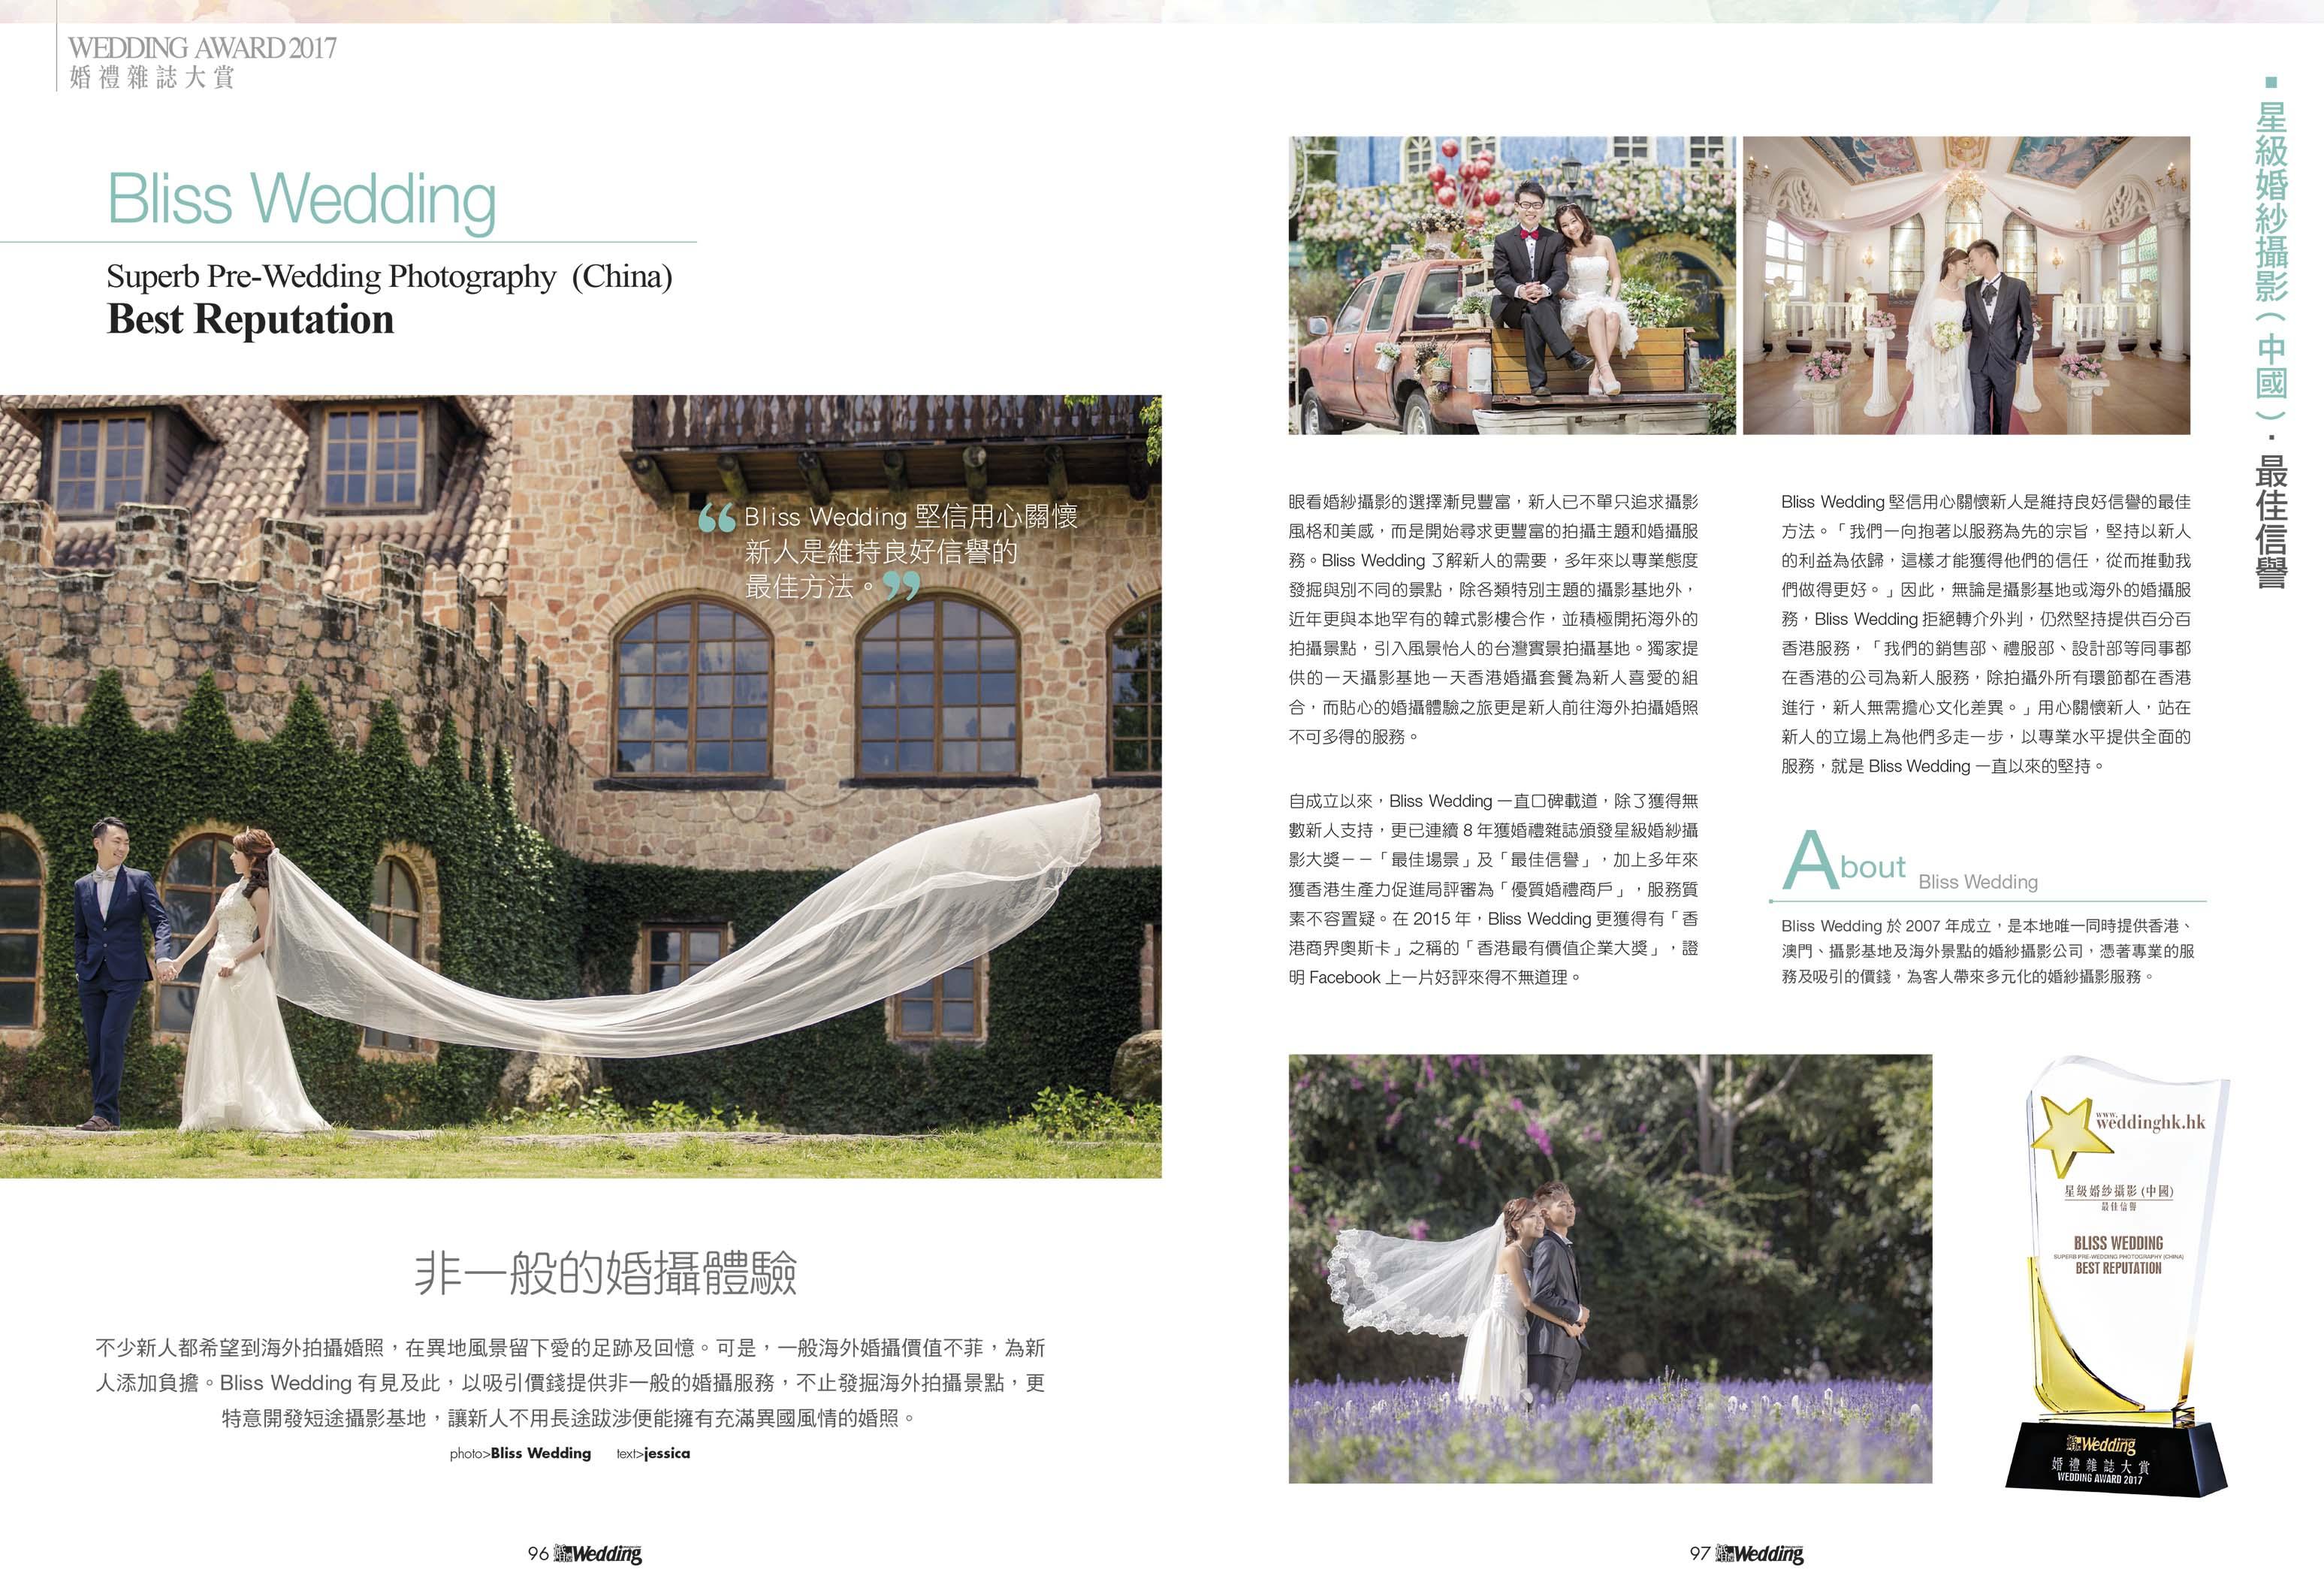 wedding-magazine-2017-awards-a